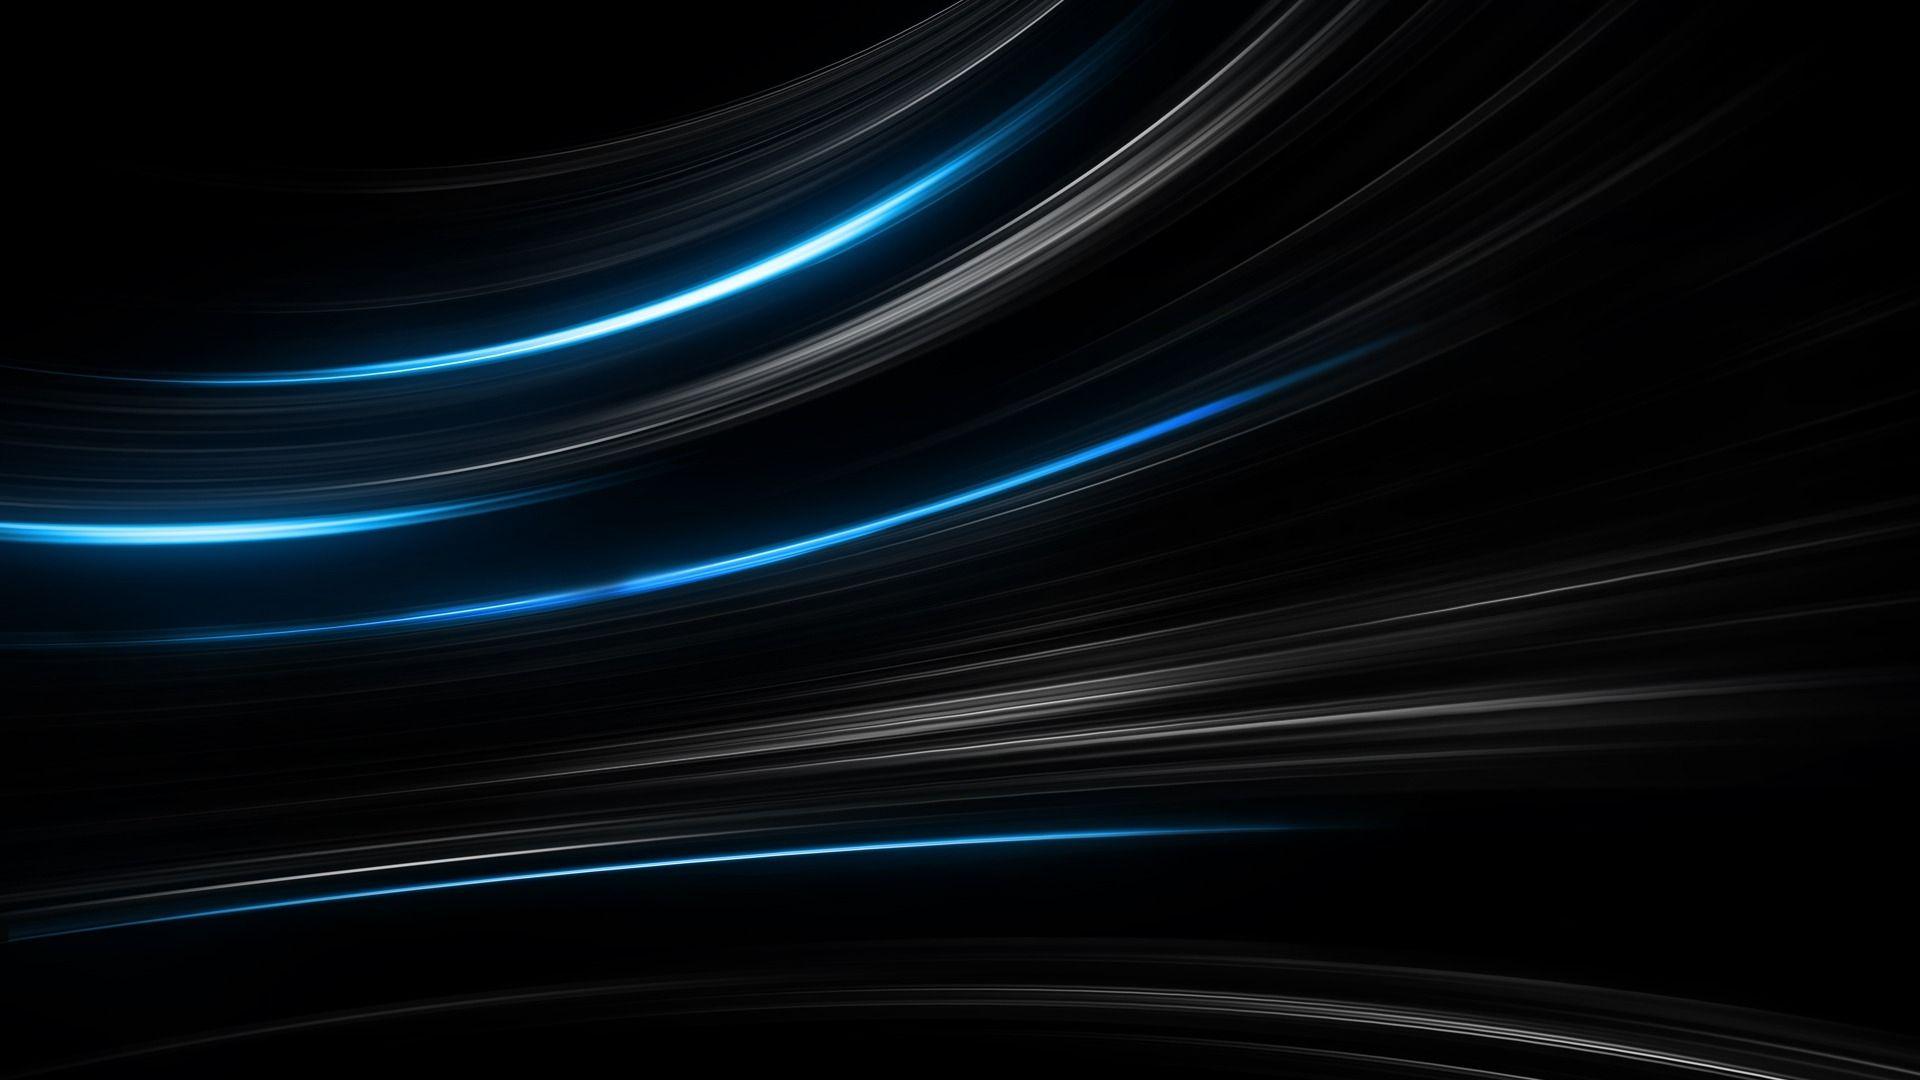 Full Black Wallpapers Wallpaper Dark Blue Wallpaper Black And